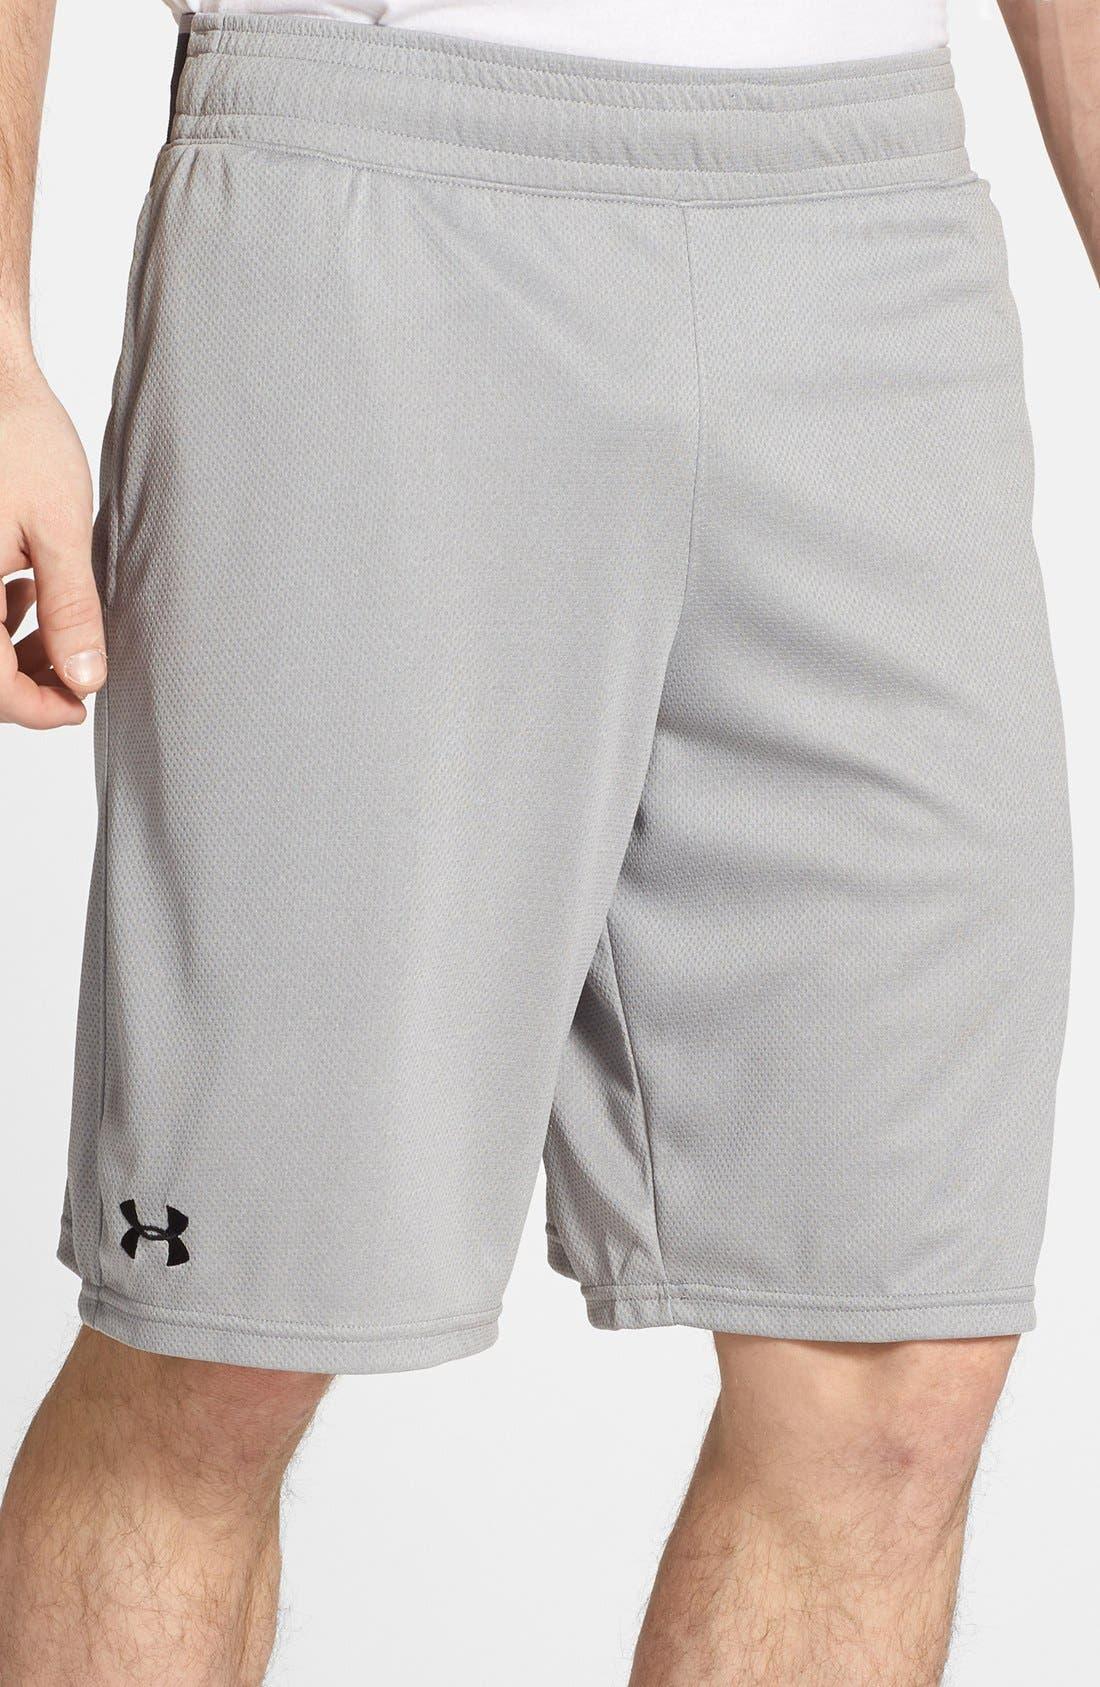 Main Image - Under Armour 'Reflex' HeatGear® Mesh Knit Shorts